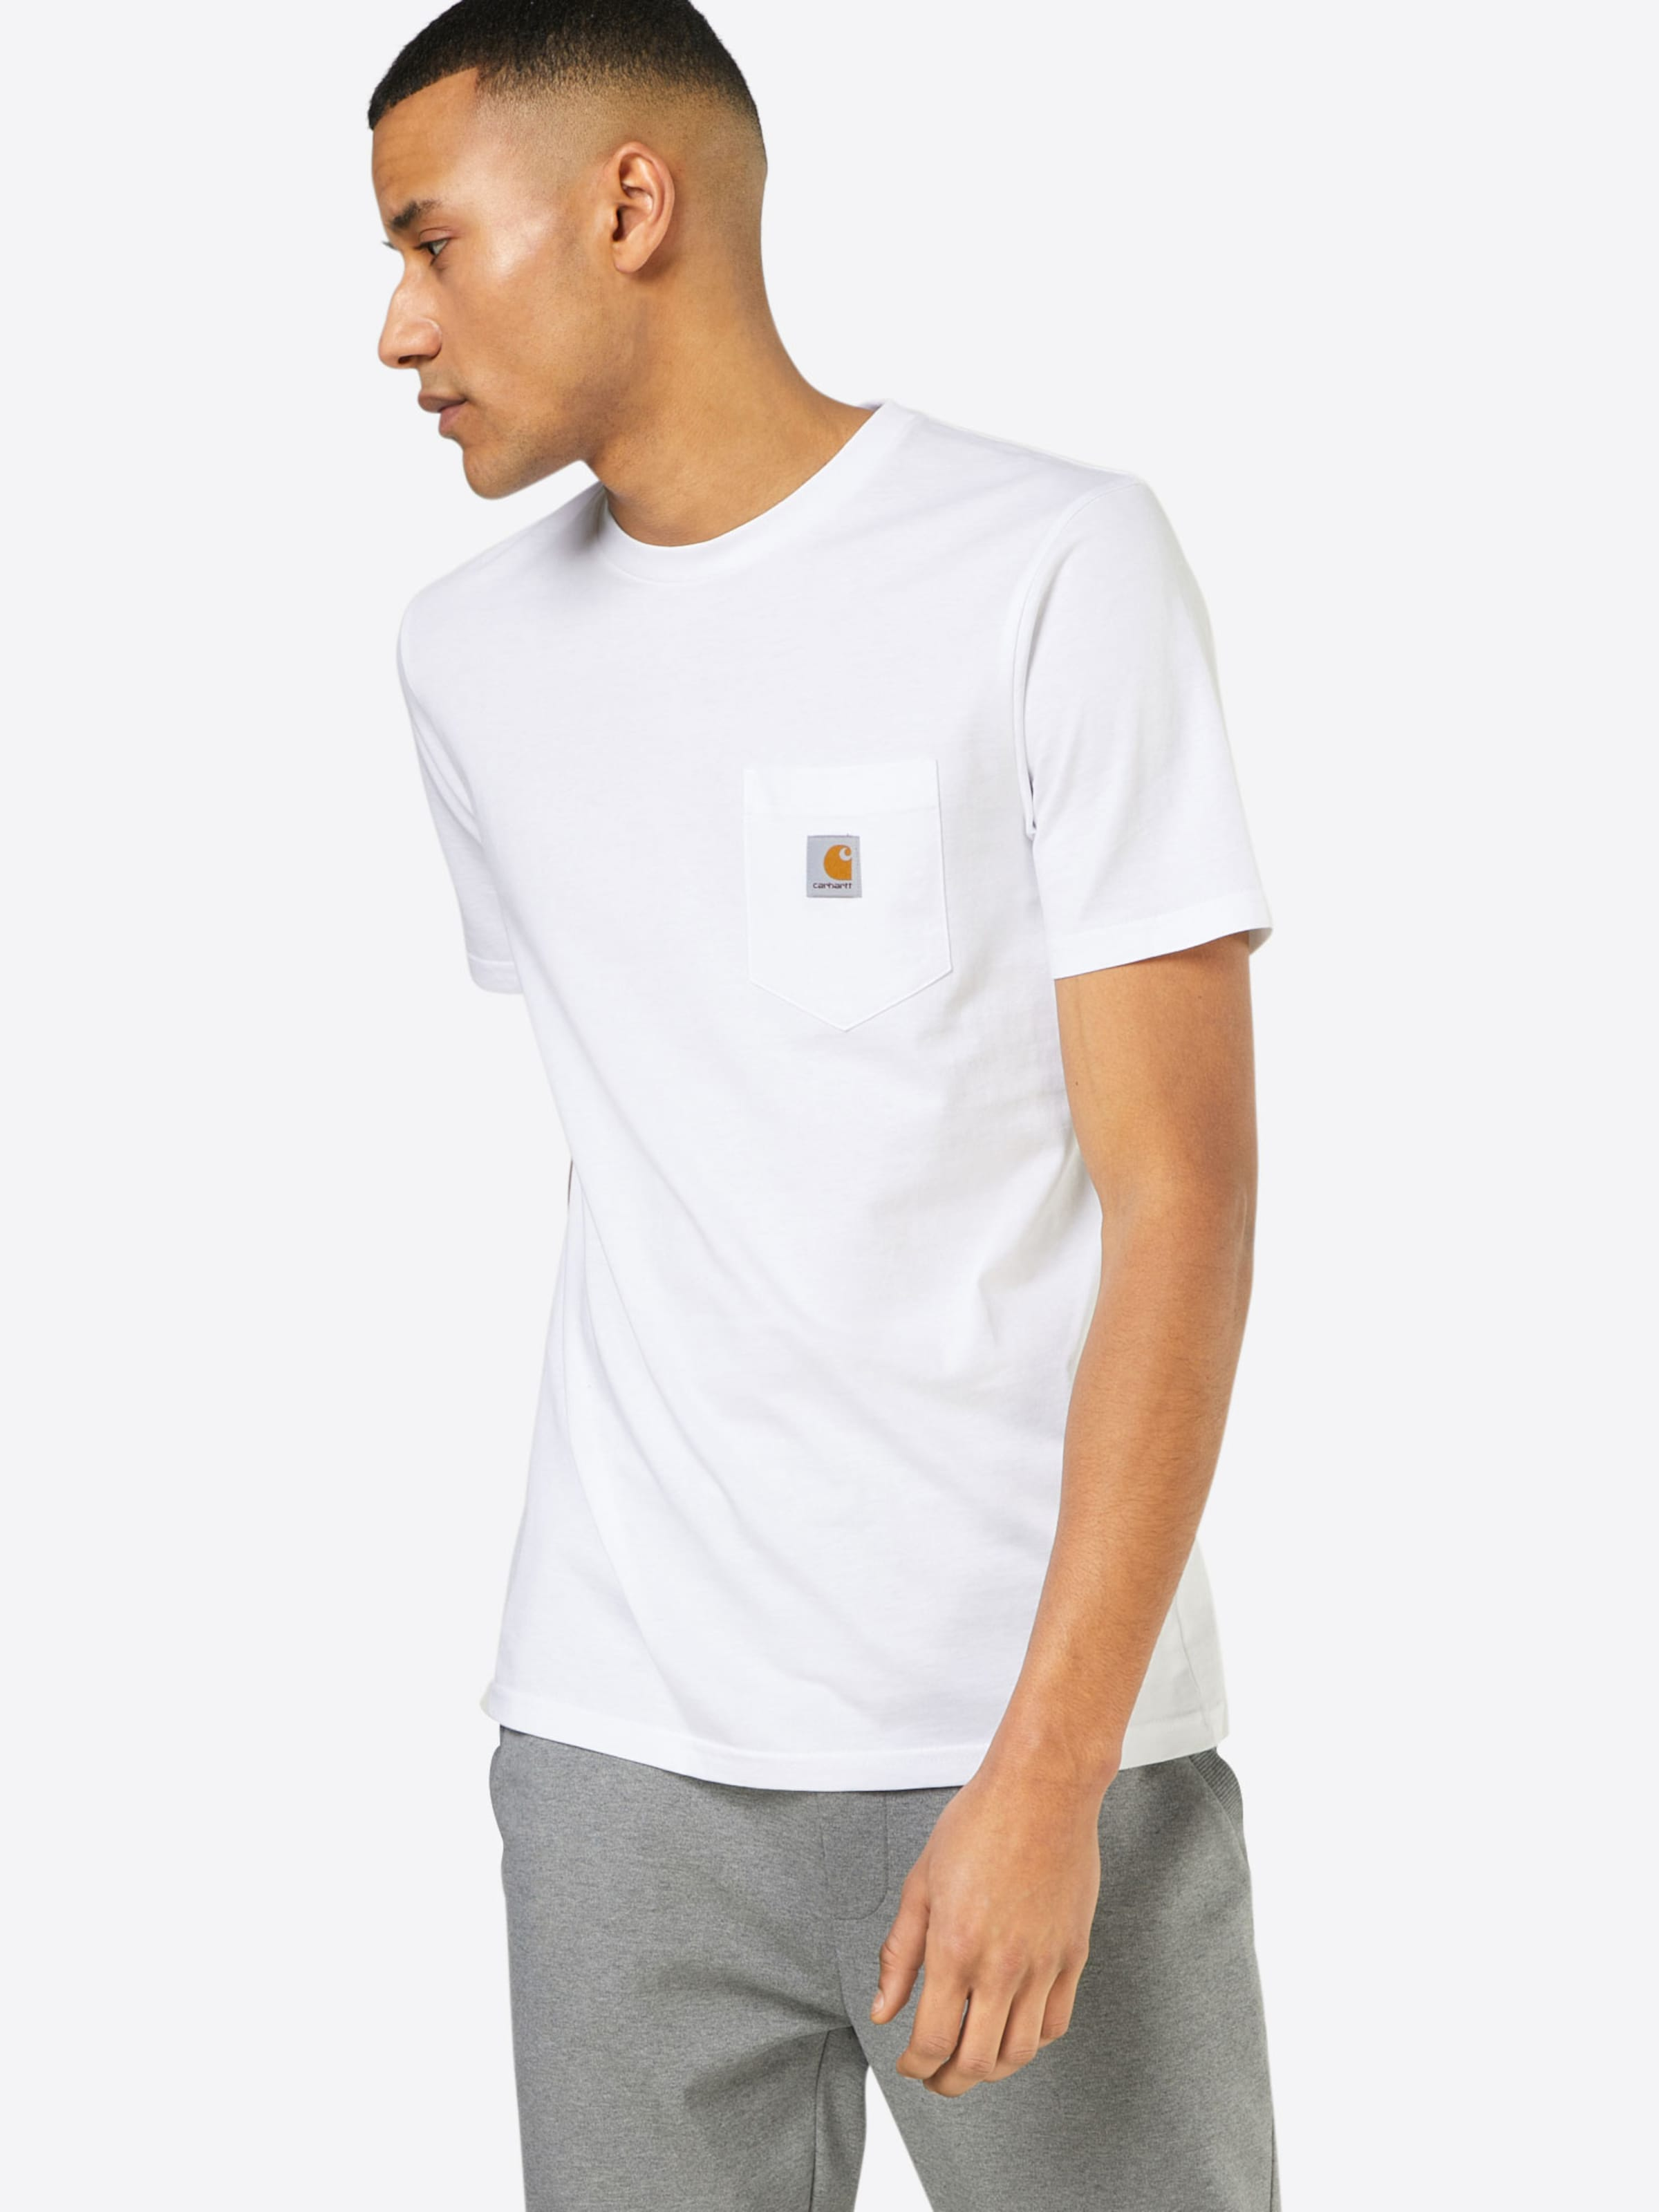 shirt Blanc En Wip Carhartt T xeQordCBW